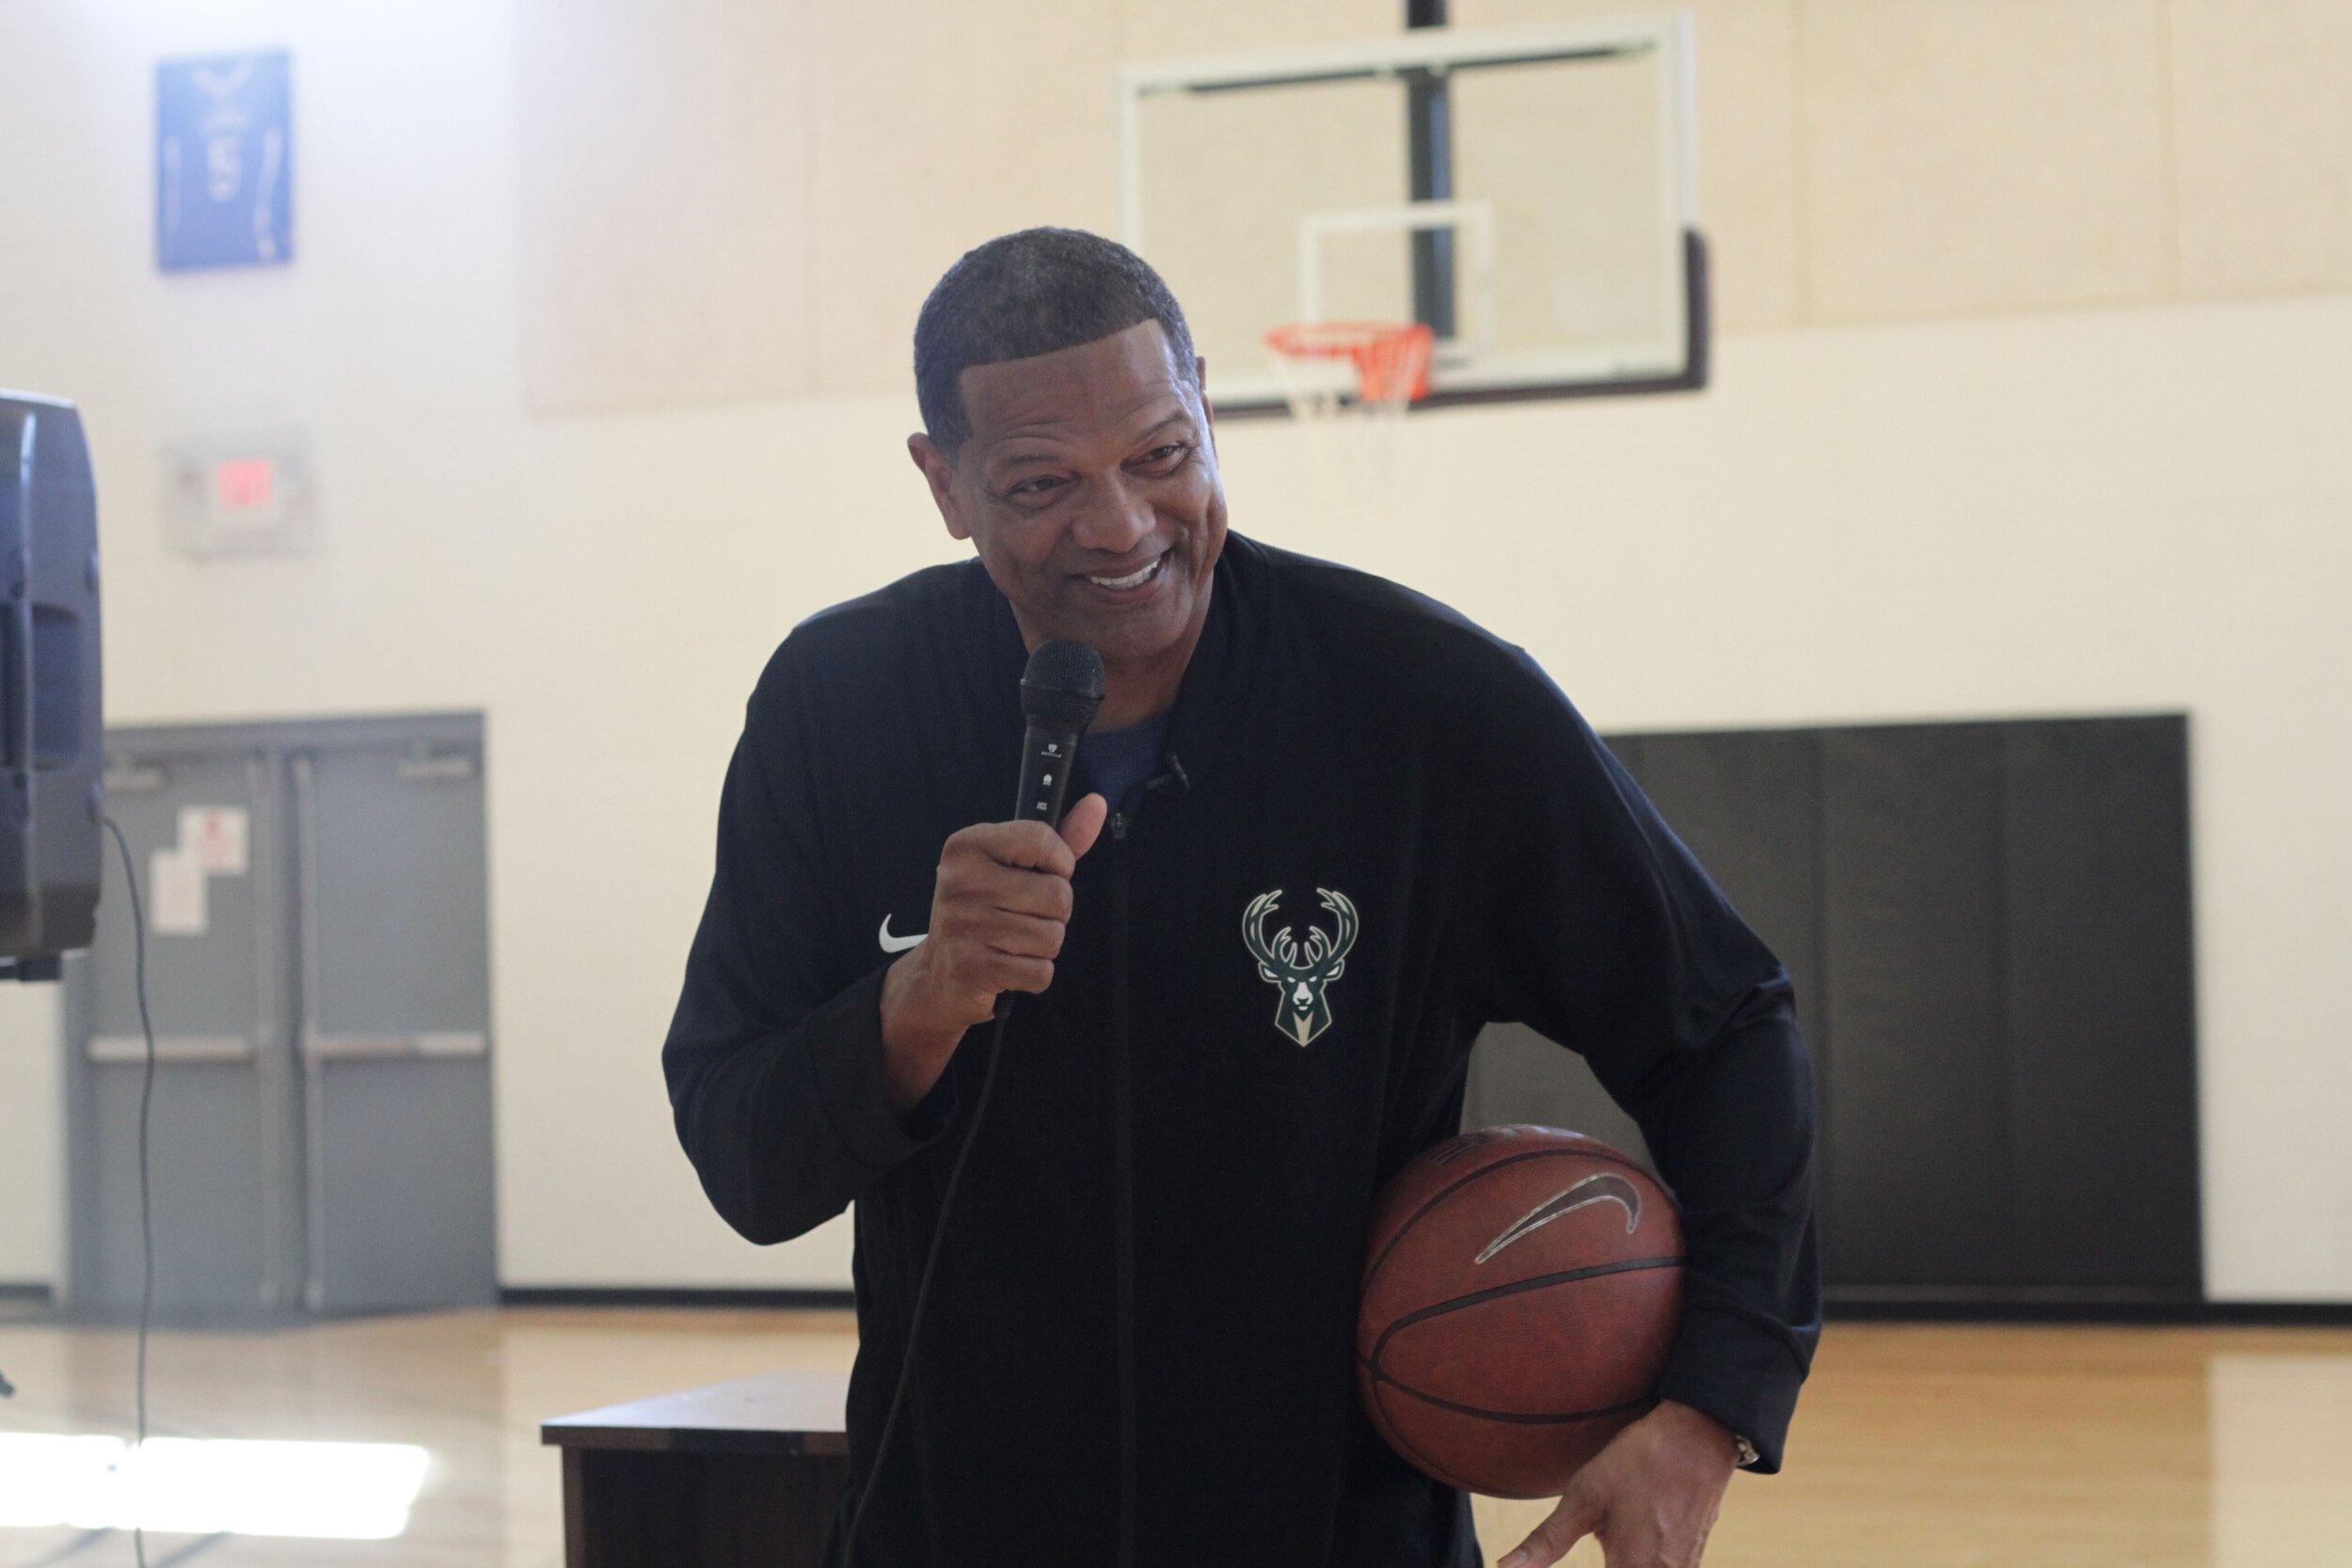 Marques Johnson hosts Running Rebels Community Organization -- an organization dedicated to developing Milwaukee's youth - EPIC Gala-lotta.